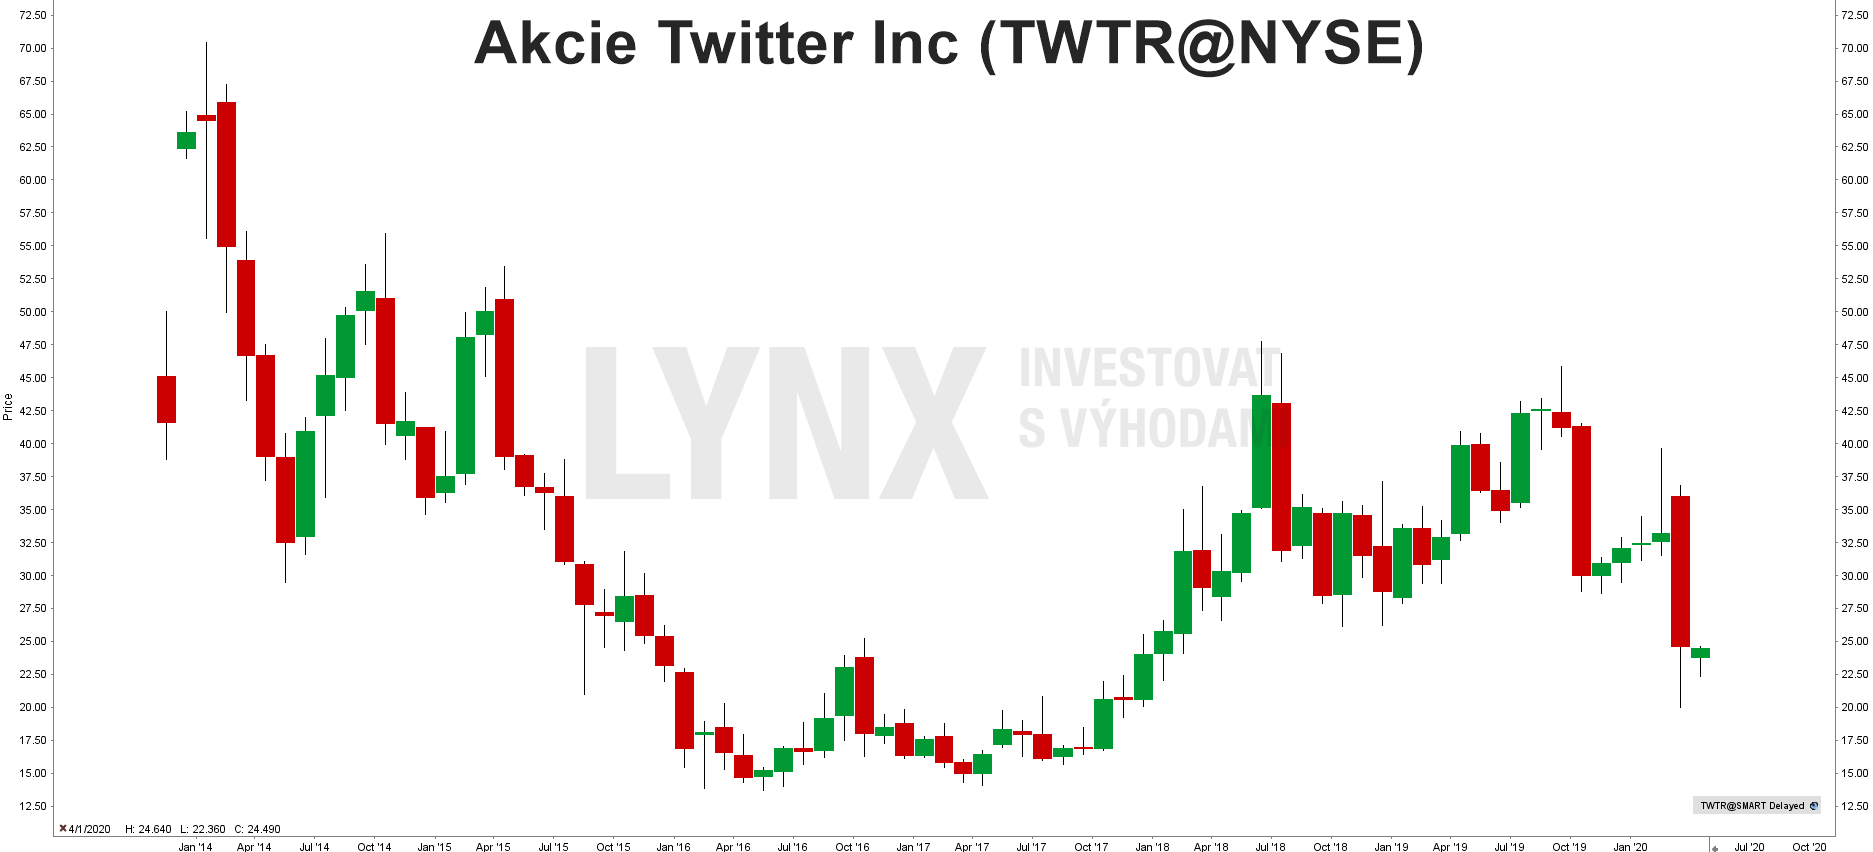 Graf akcie Twitter